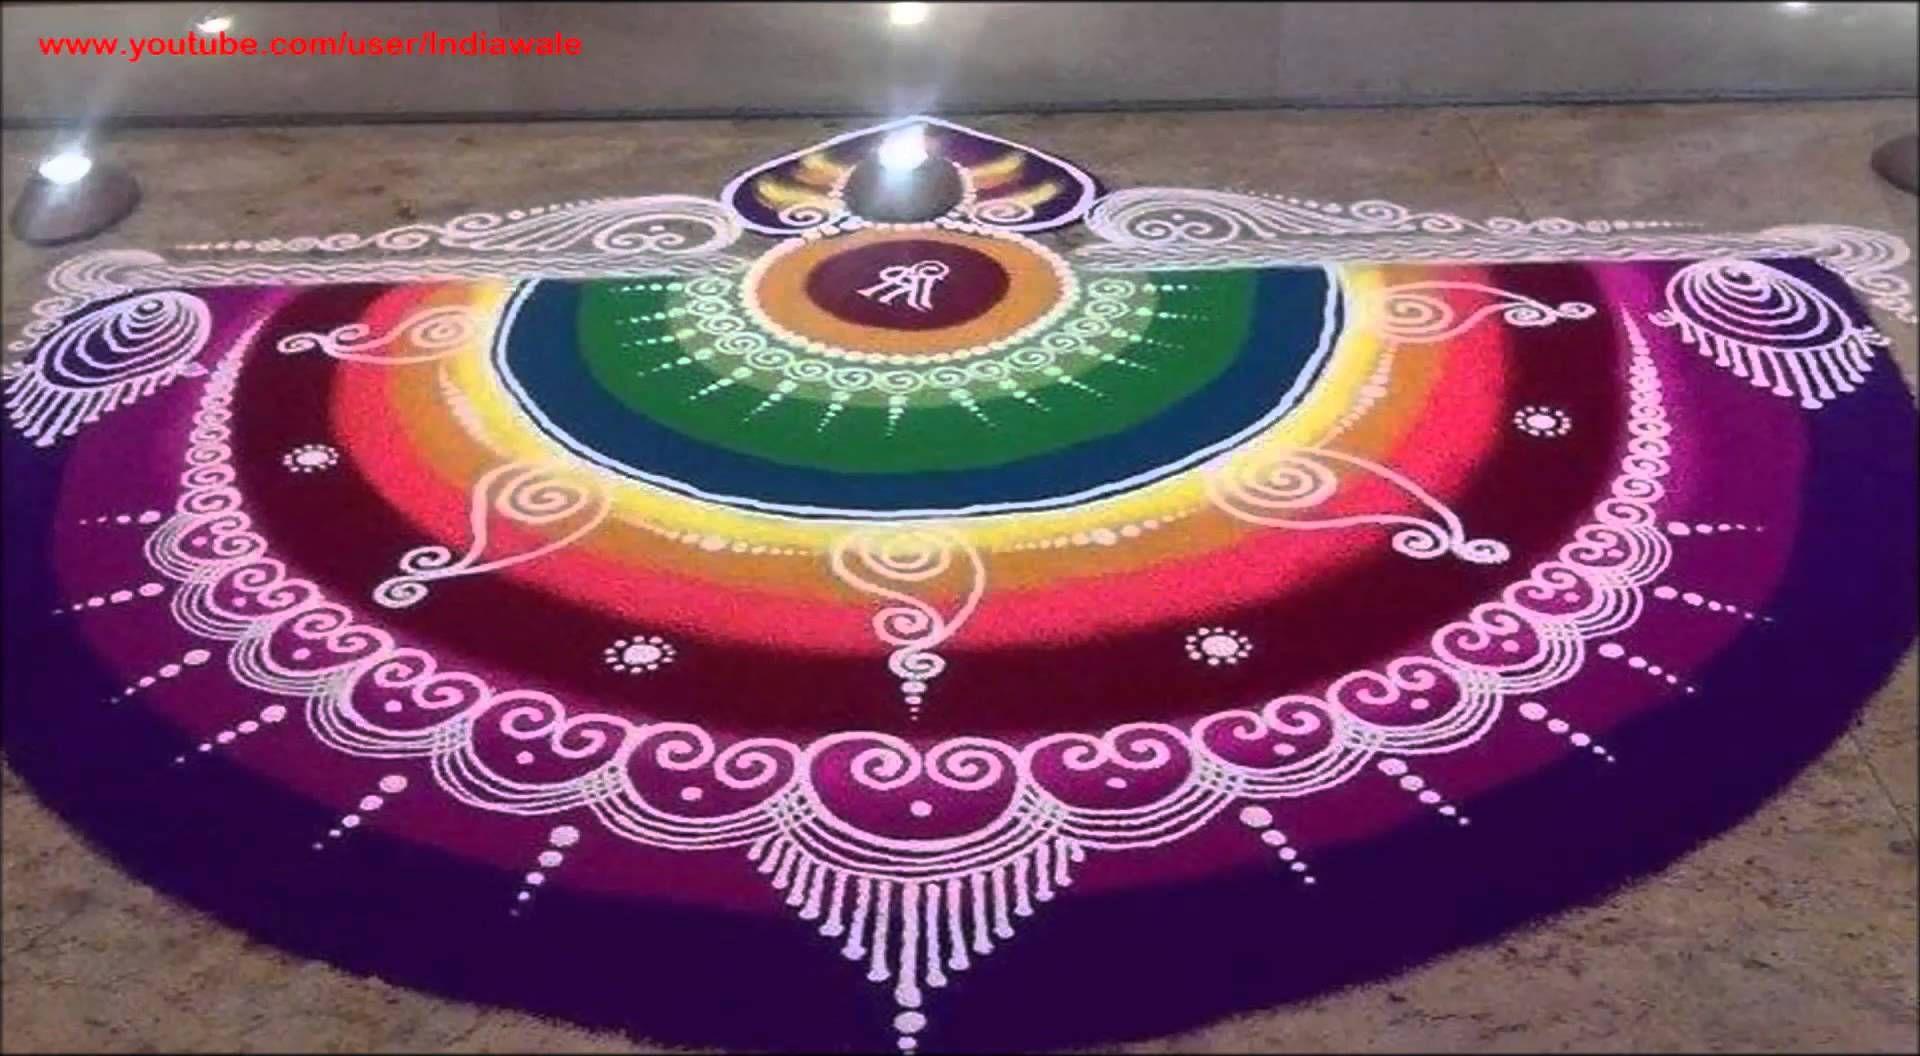 Watch 10 Best Sanskar Bharti Rangoli Designs To Try In 2019 video